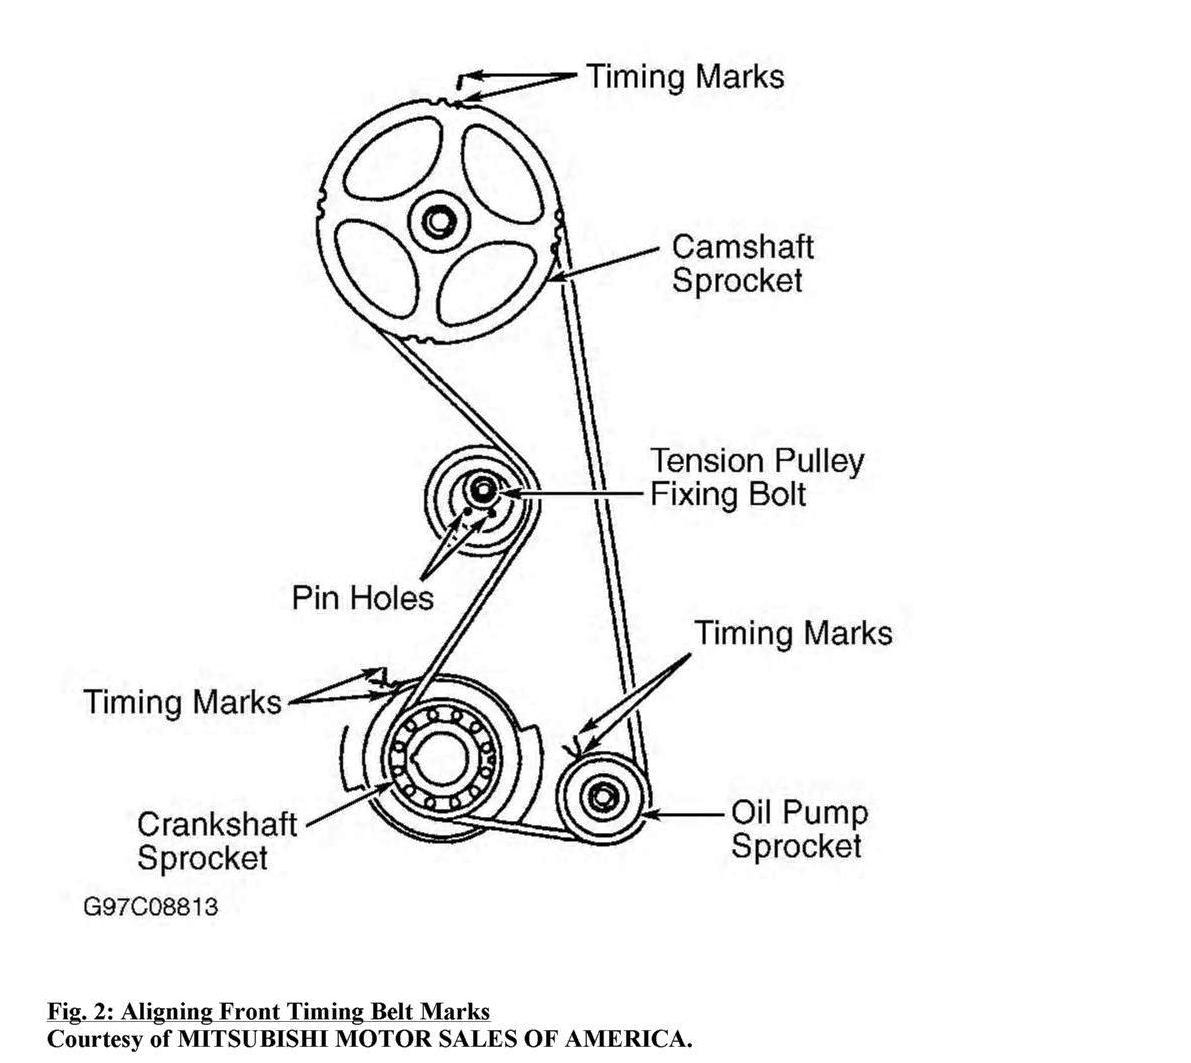 hight resolution of 2003 mitsubishi galant timing belt marks